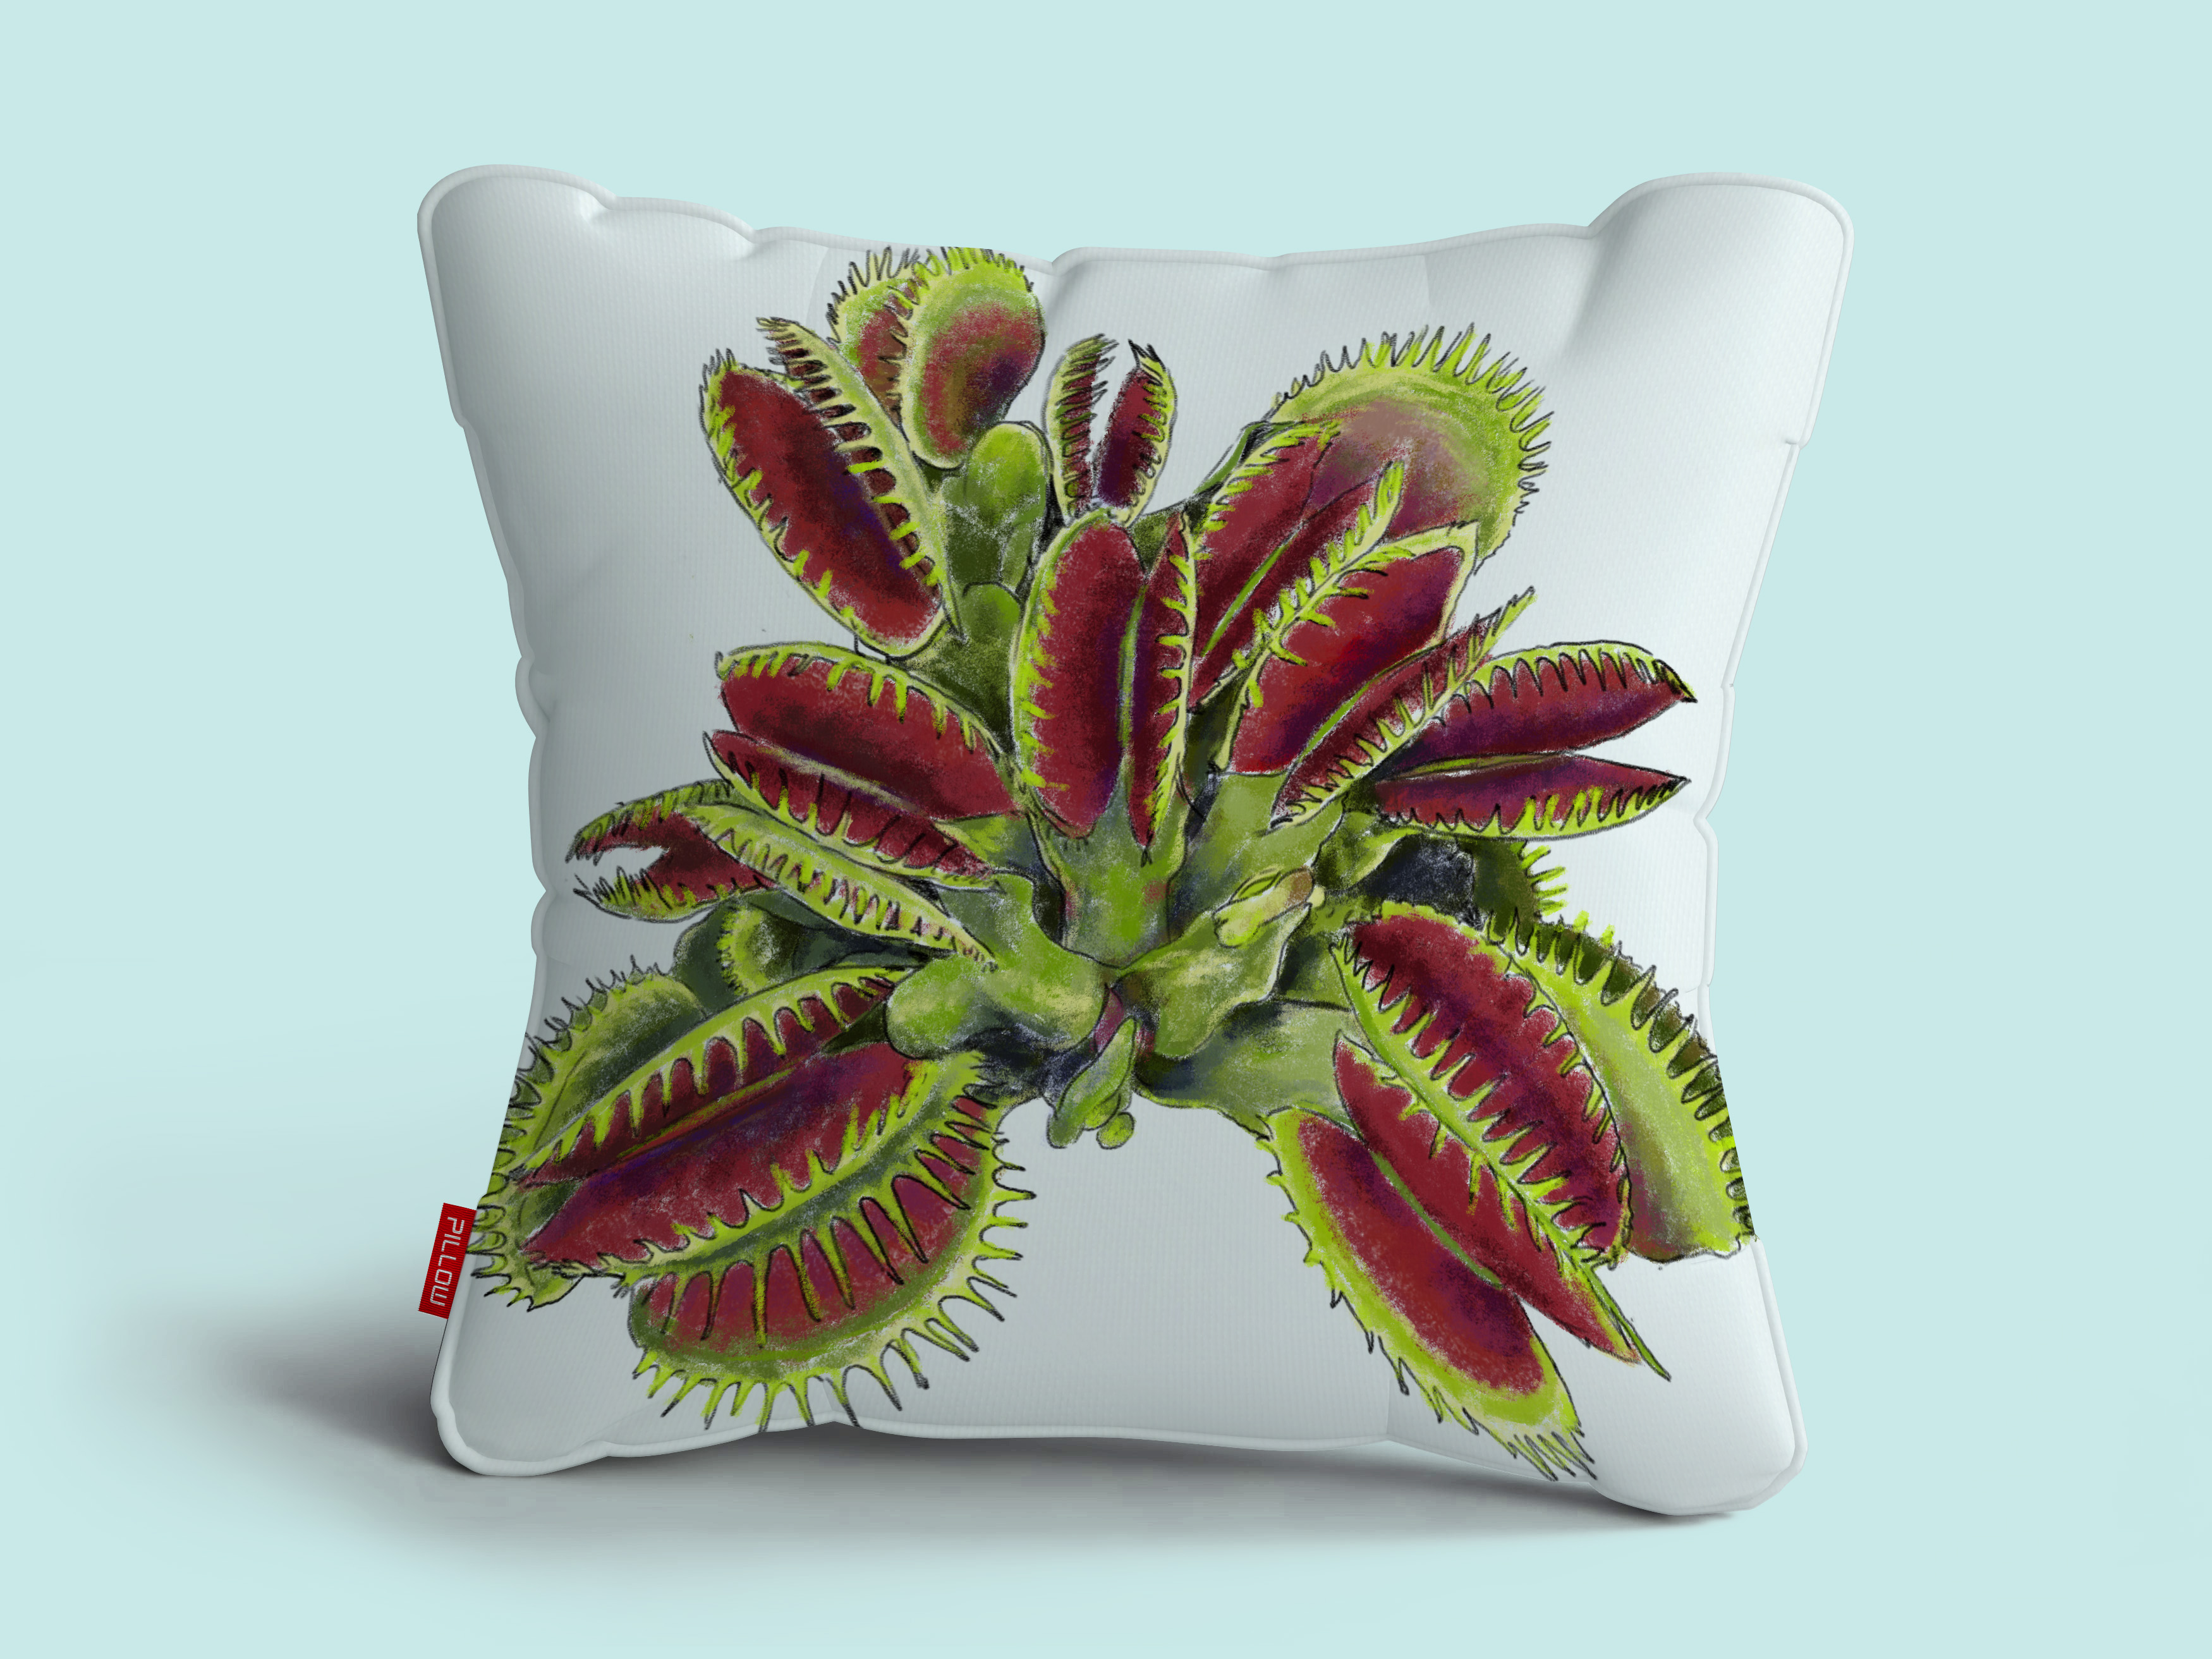 carnivorous plant2